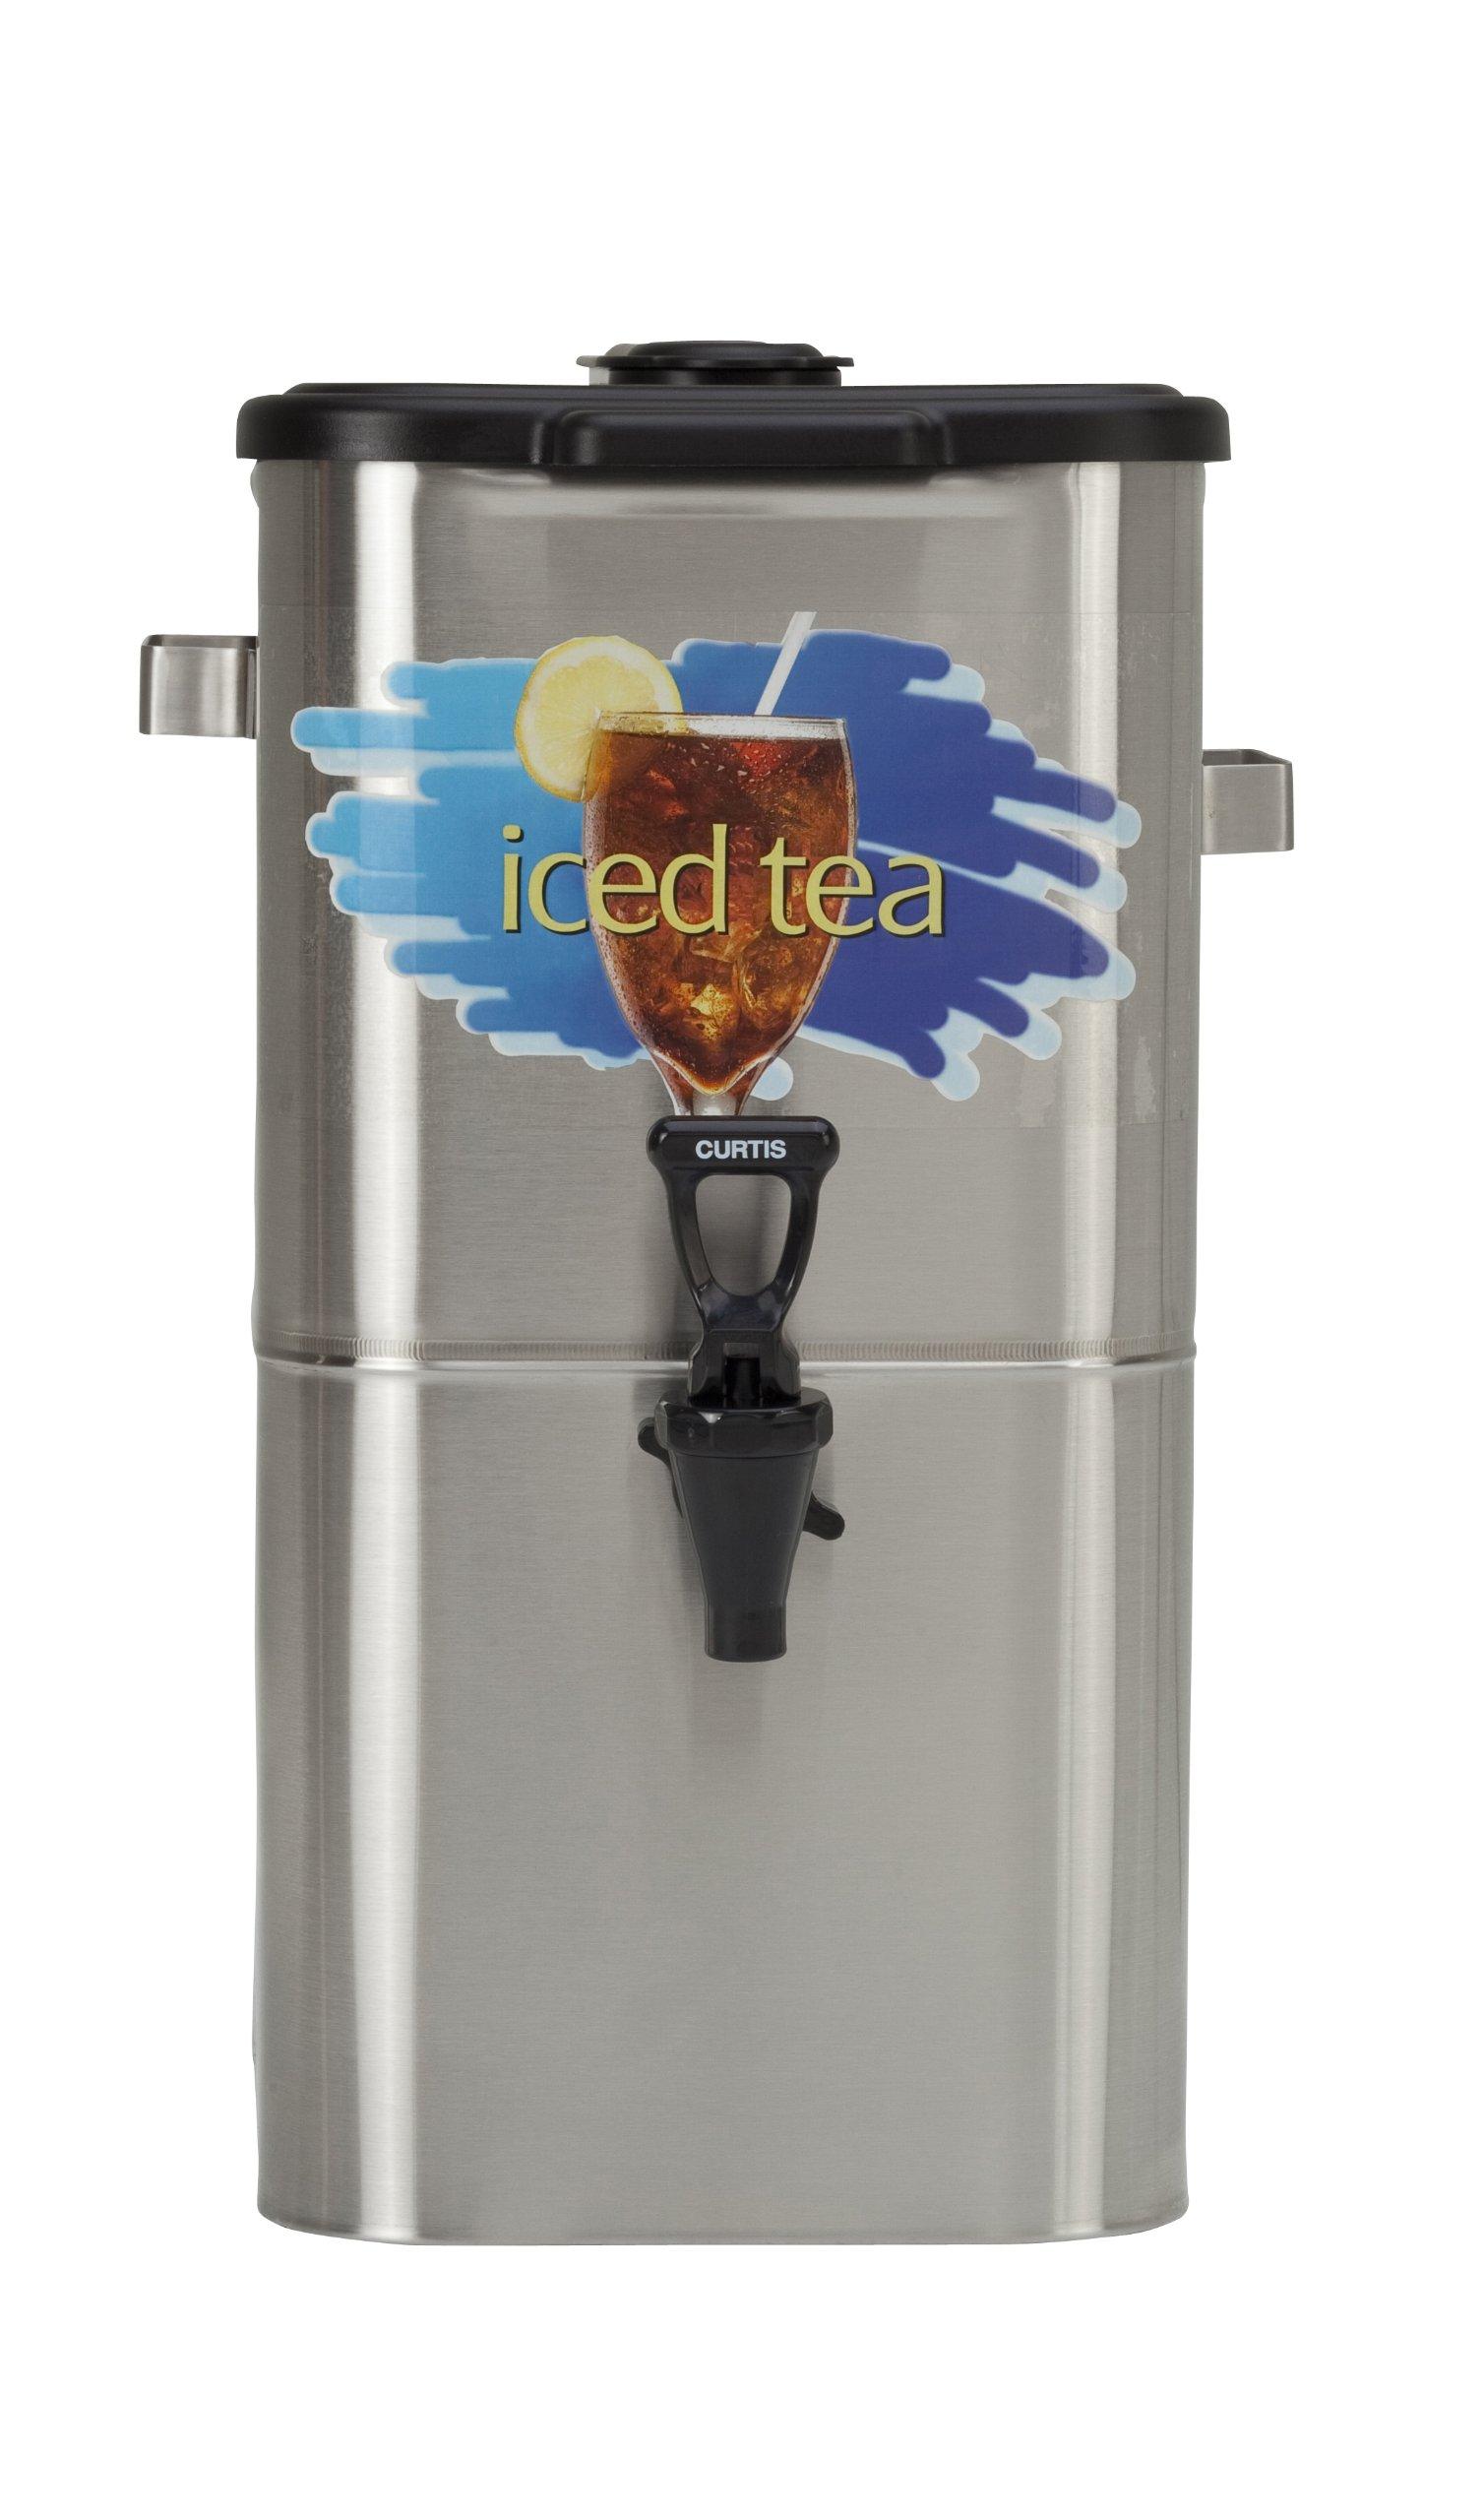 Wilbur Curtis Iced Tea Dispenser 4.0 Gallon Tea Dispenser, Oval 17''H - Designed to Preserve Flavor - TCO417A000 (Each) by Wilbur Curtis